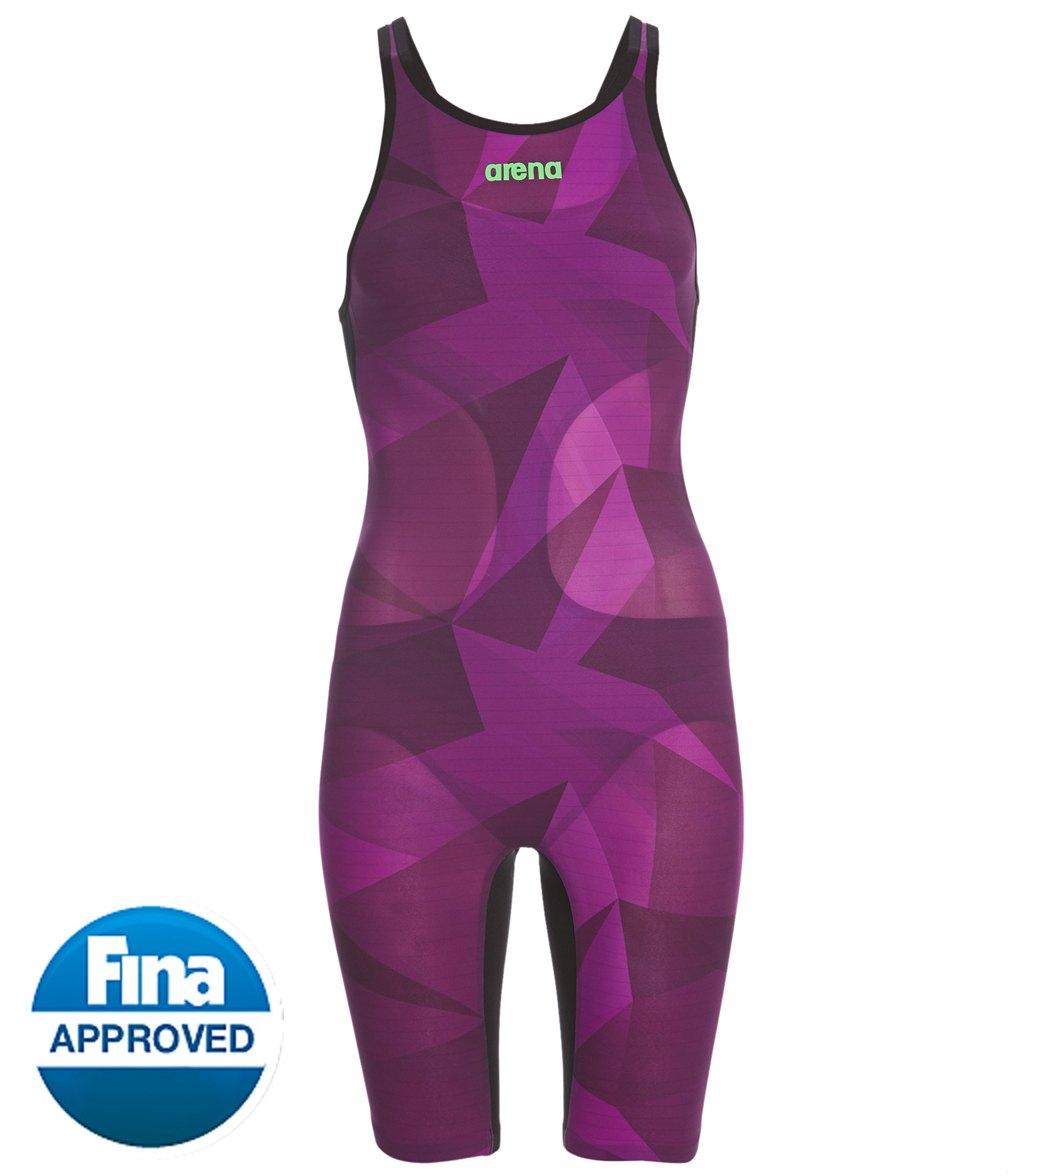 Arena Women s Limited Edition Carbon Air SL Open Back Tech Suit ... 03cb1a0160